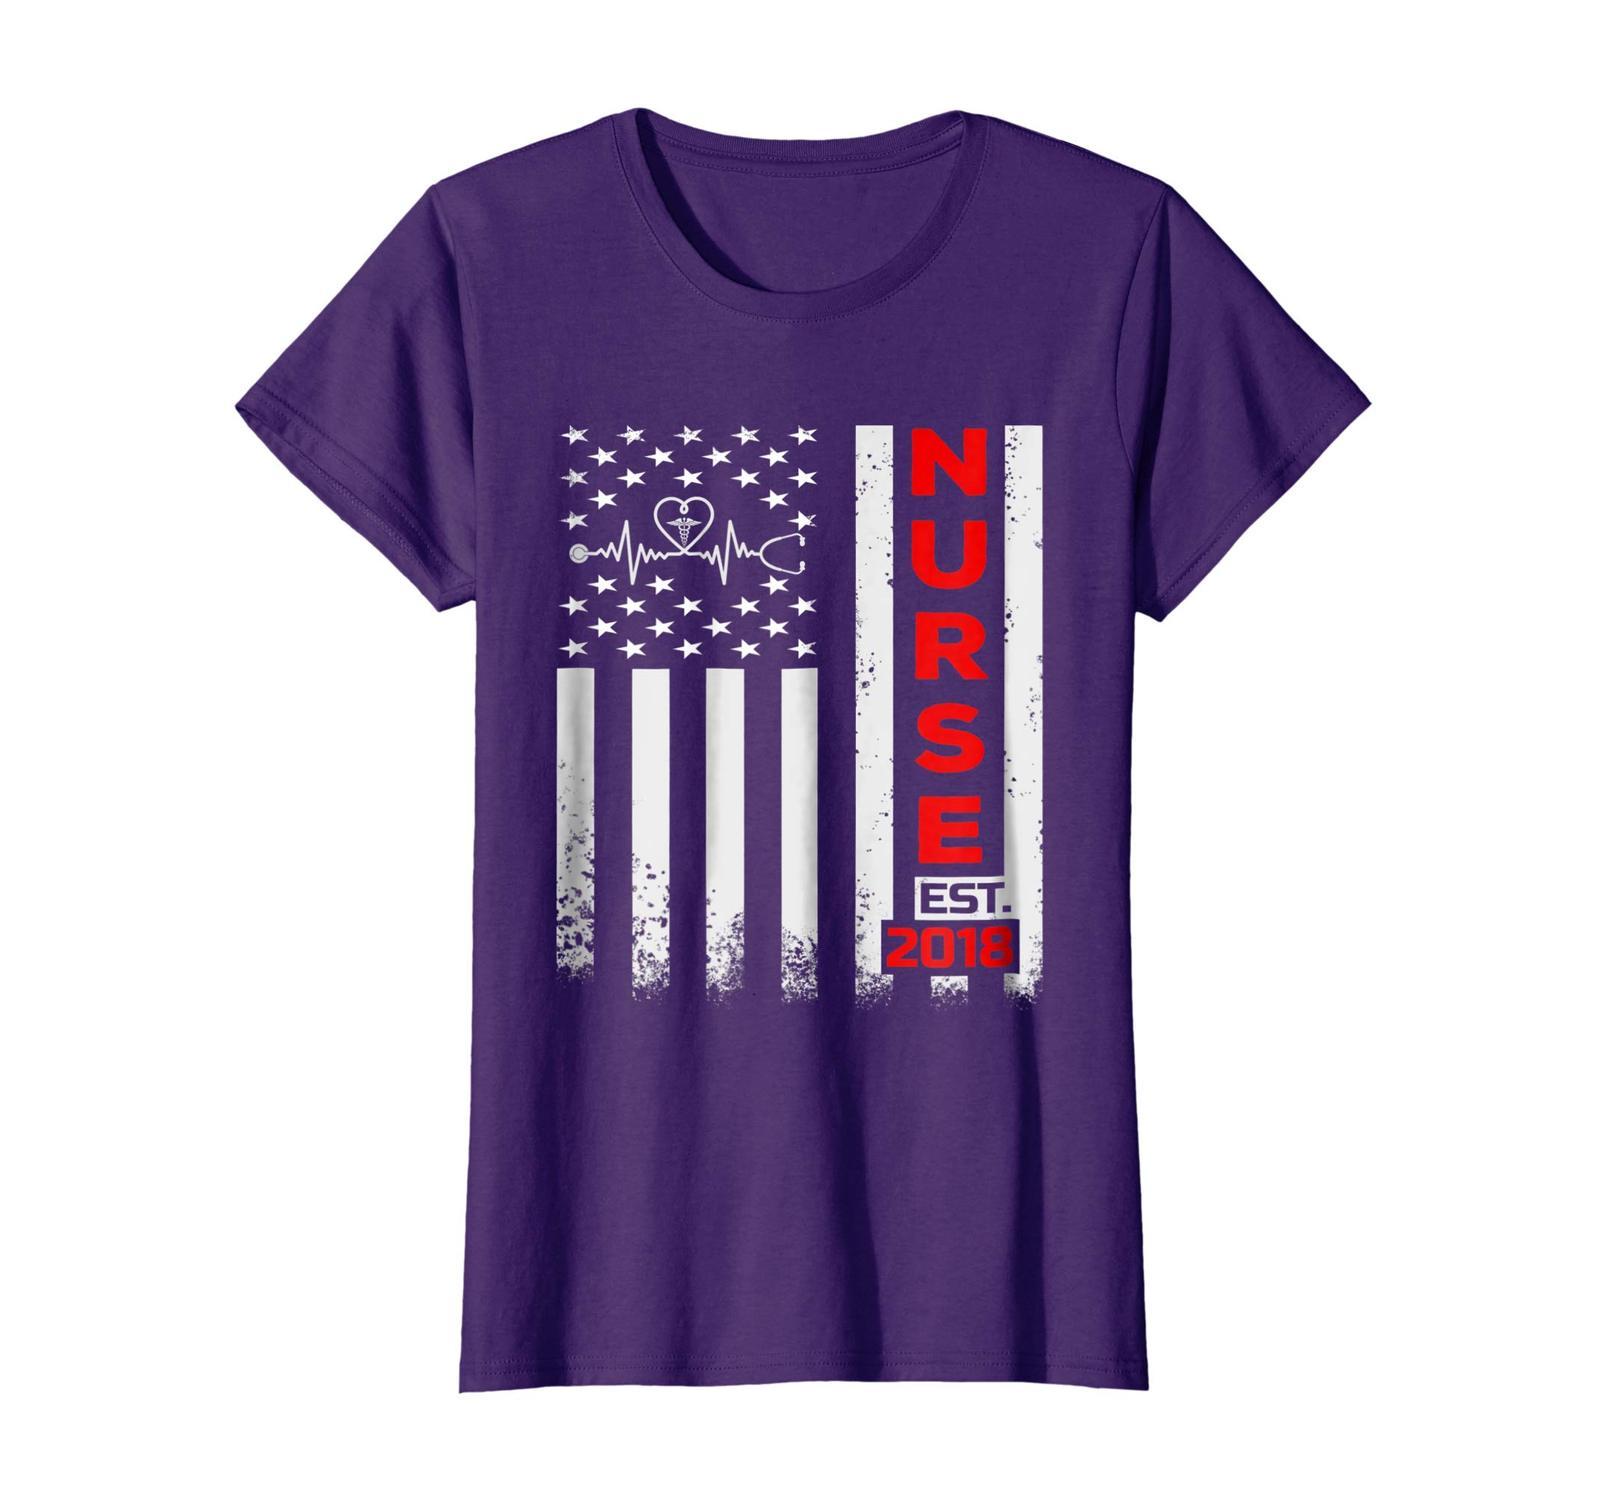 Funny Tee - American Flag Nurses T-Shirt Nurse Est 2018 Graduation Gifts Wowen